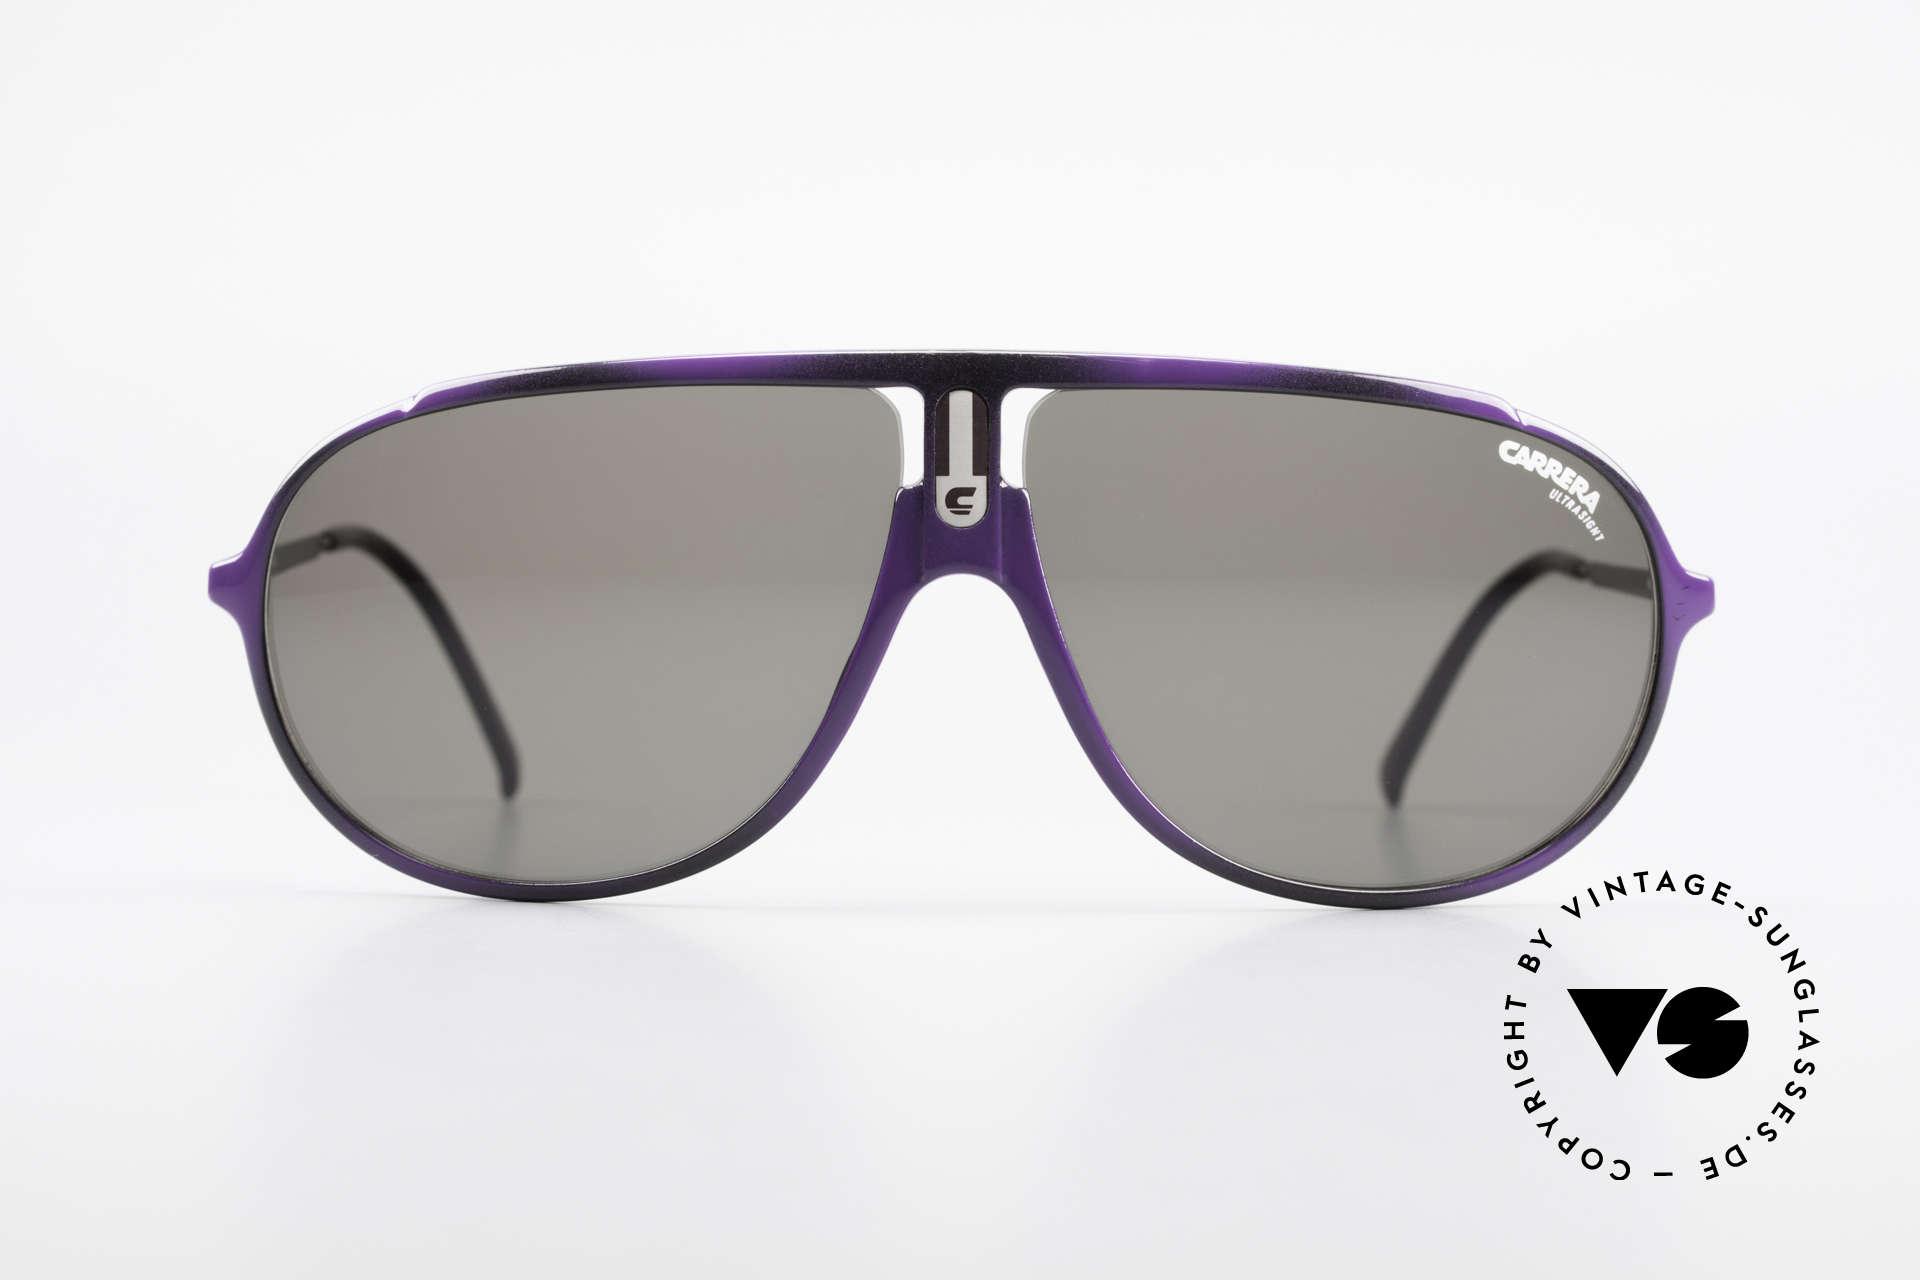 Carrera 5467 Carbon Fibre Brille Kohlefaser, extrem leichter Kunstoffrahmen aus Kohlefaser, Passend für Herren